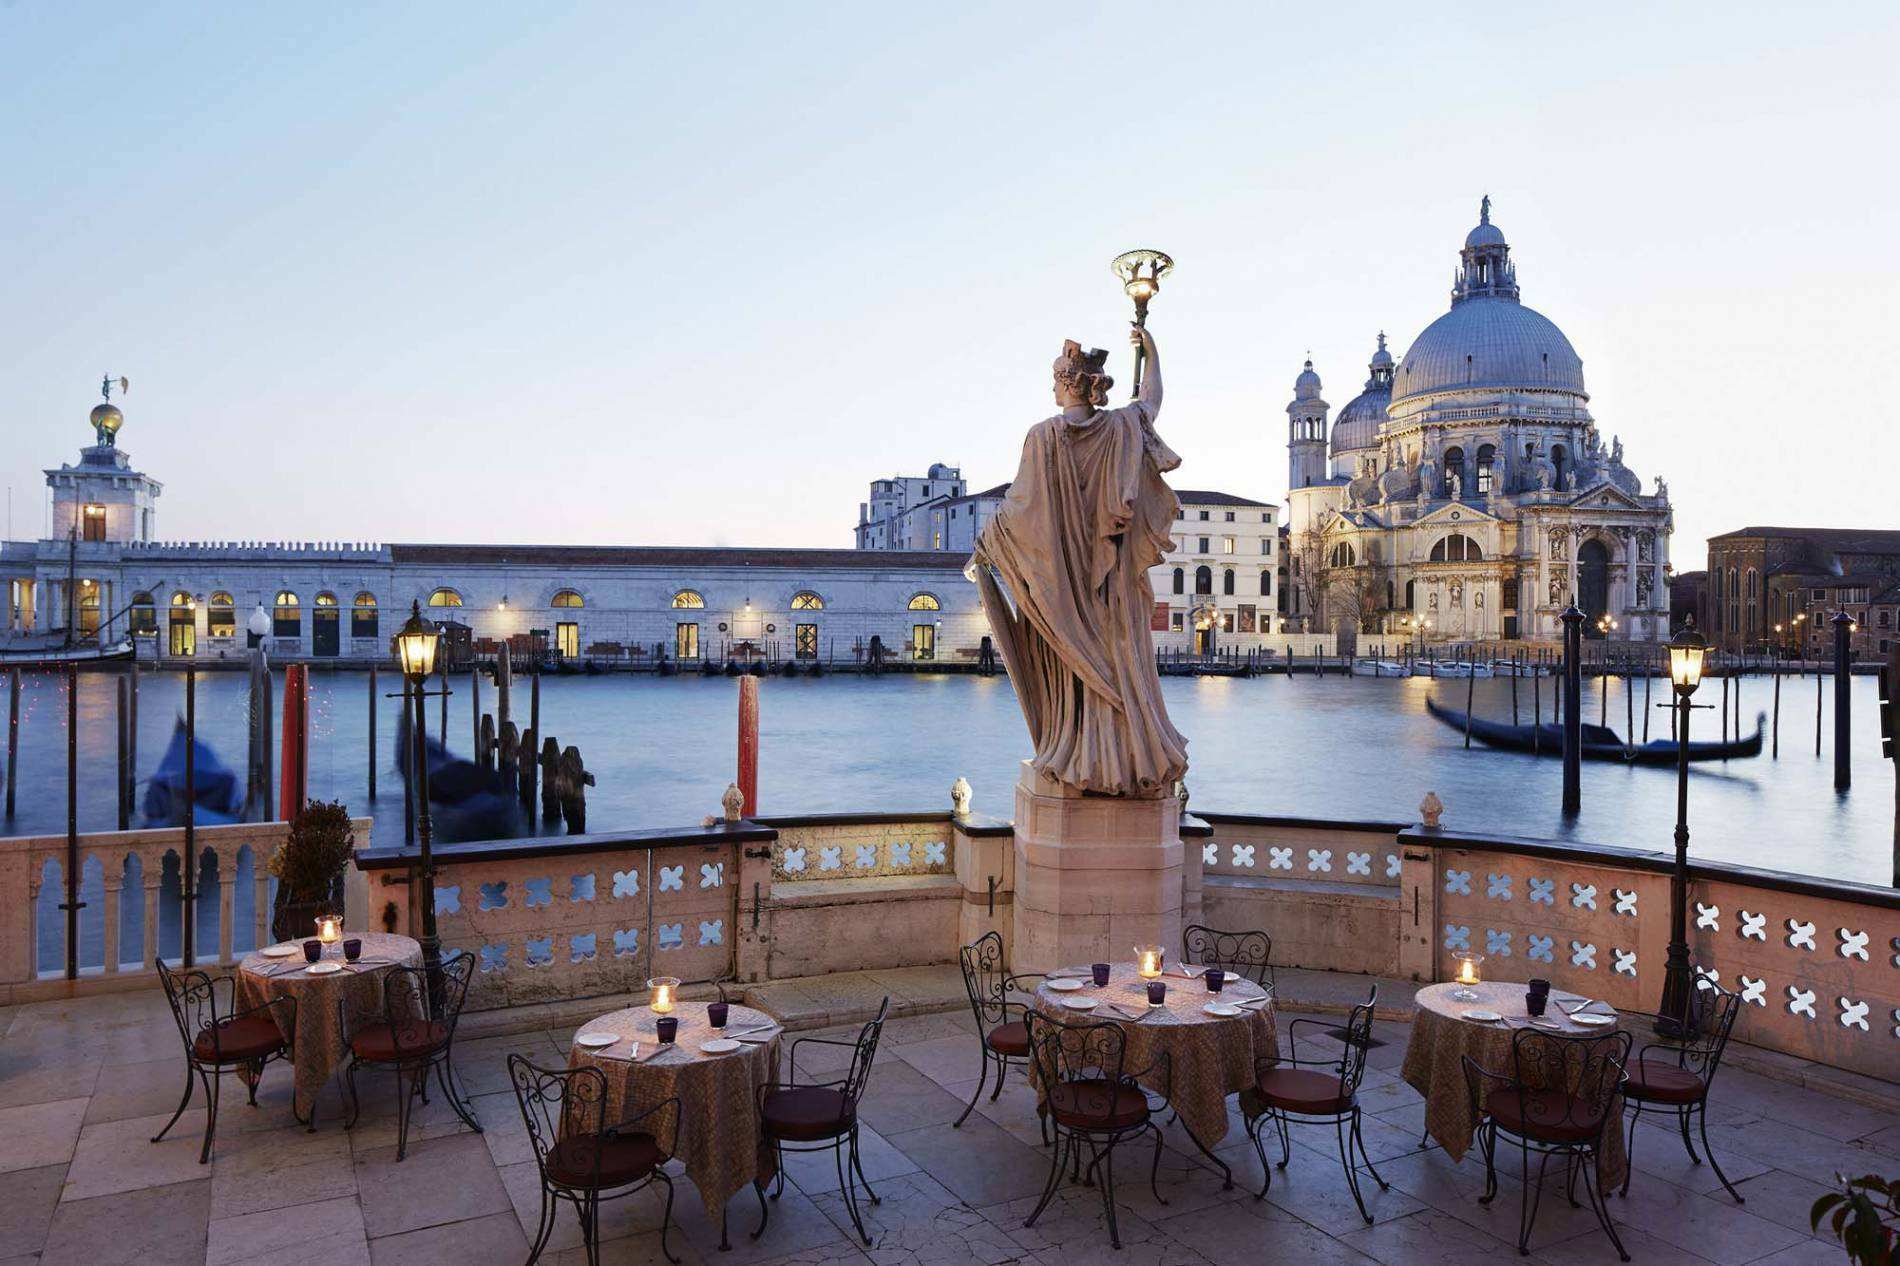 Bauer Palazzo Venise Italie Canale terrace